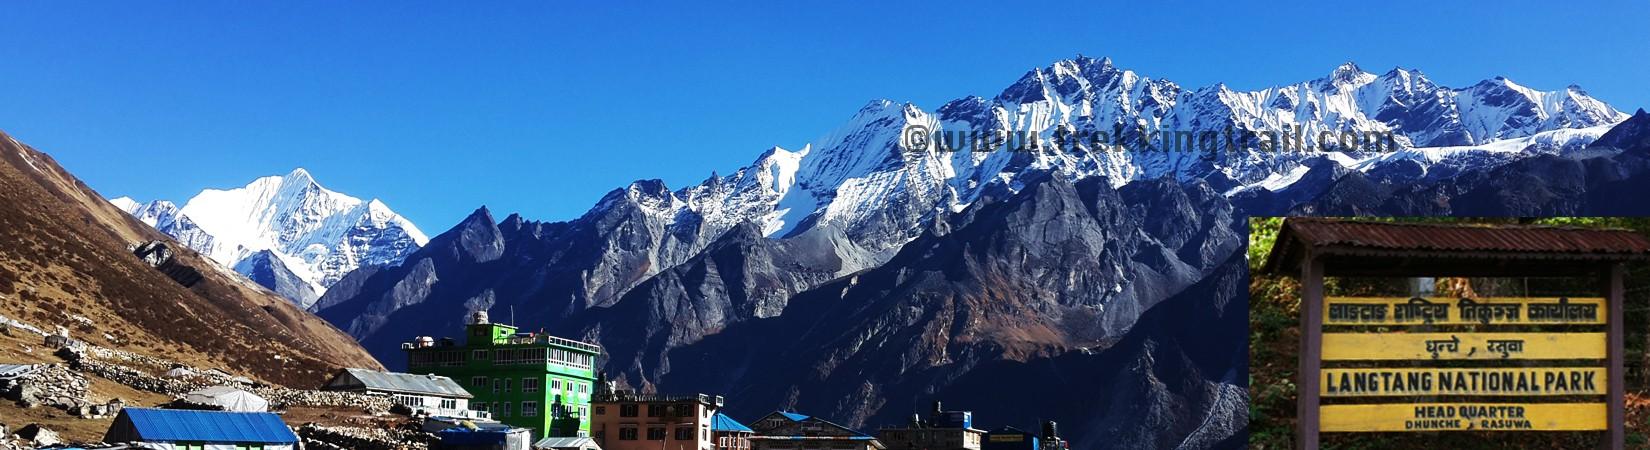 Views of Langtang Himalayas Range From Kyanjin Gompa; Final Destination of Langtang Valley Trekking